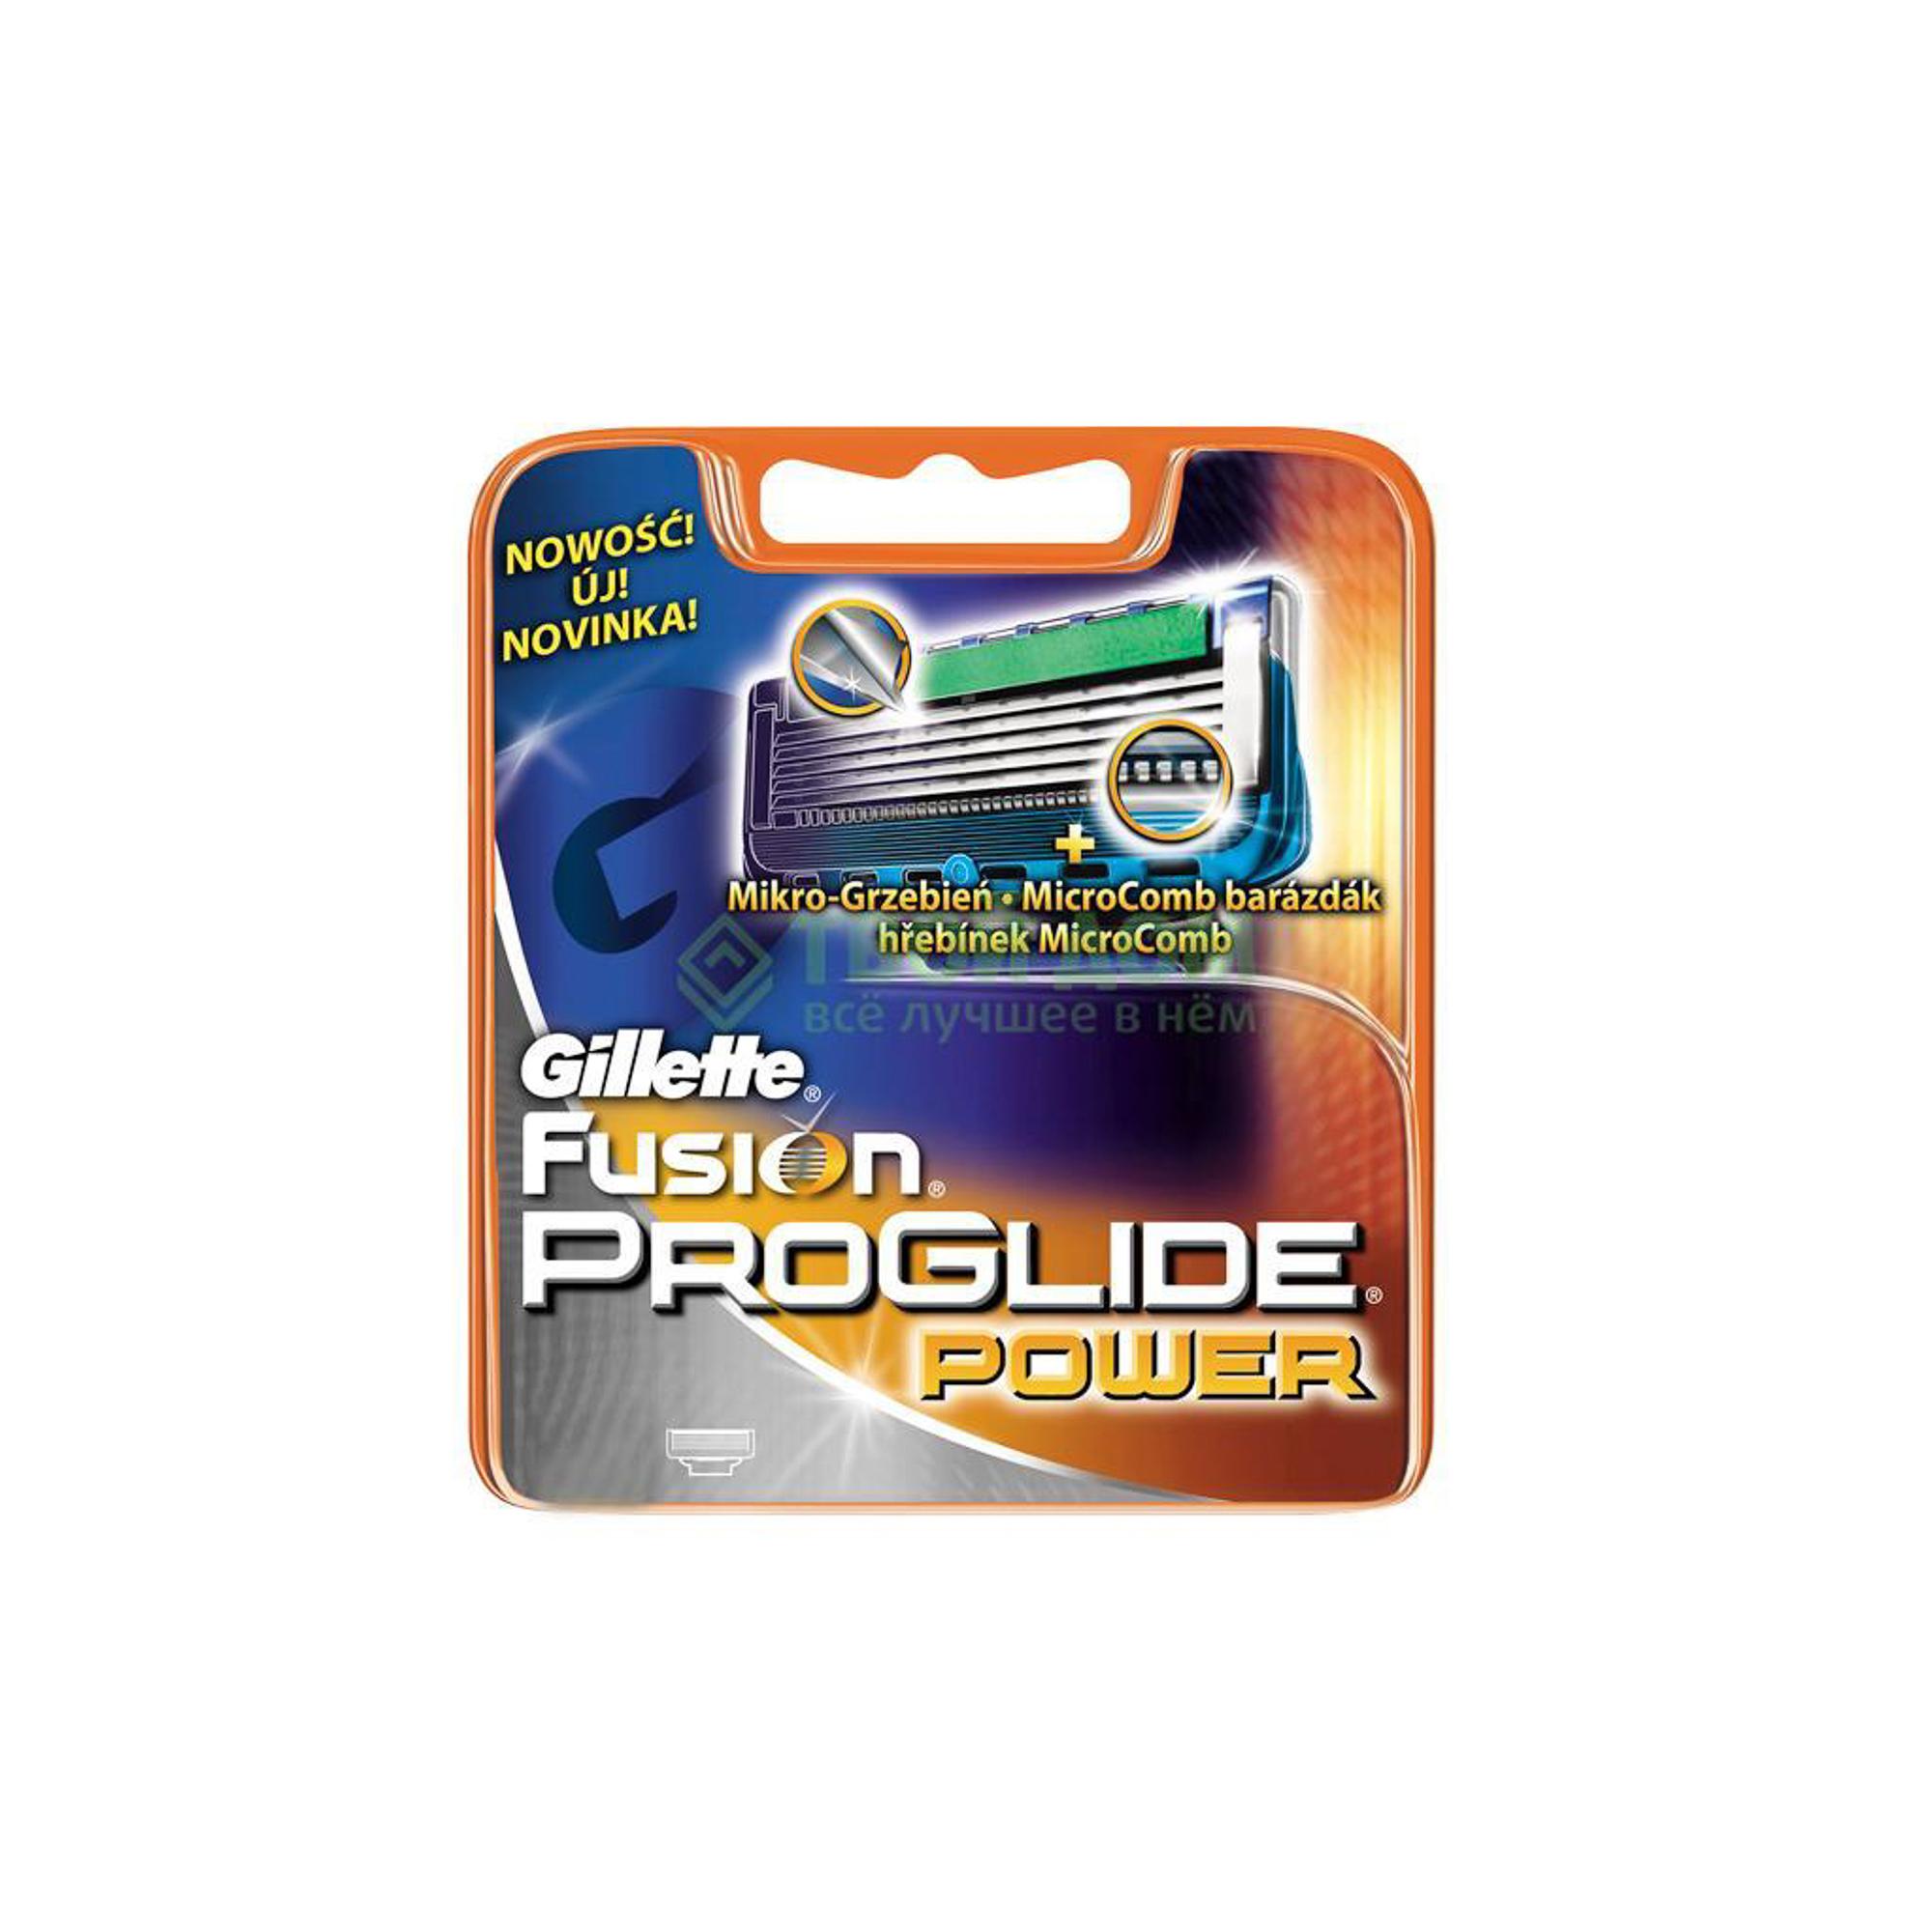 Кассеты для бритья Gillette Fusion ProGlide Power 4 шт